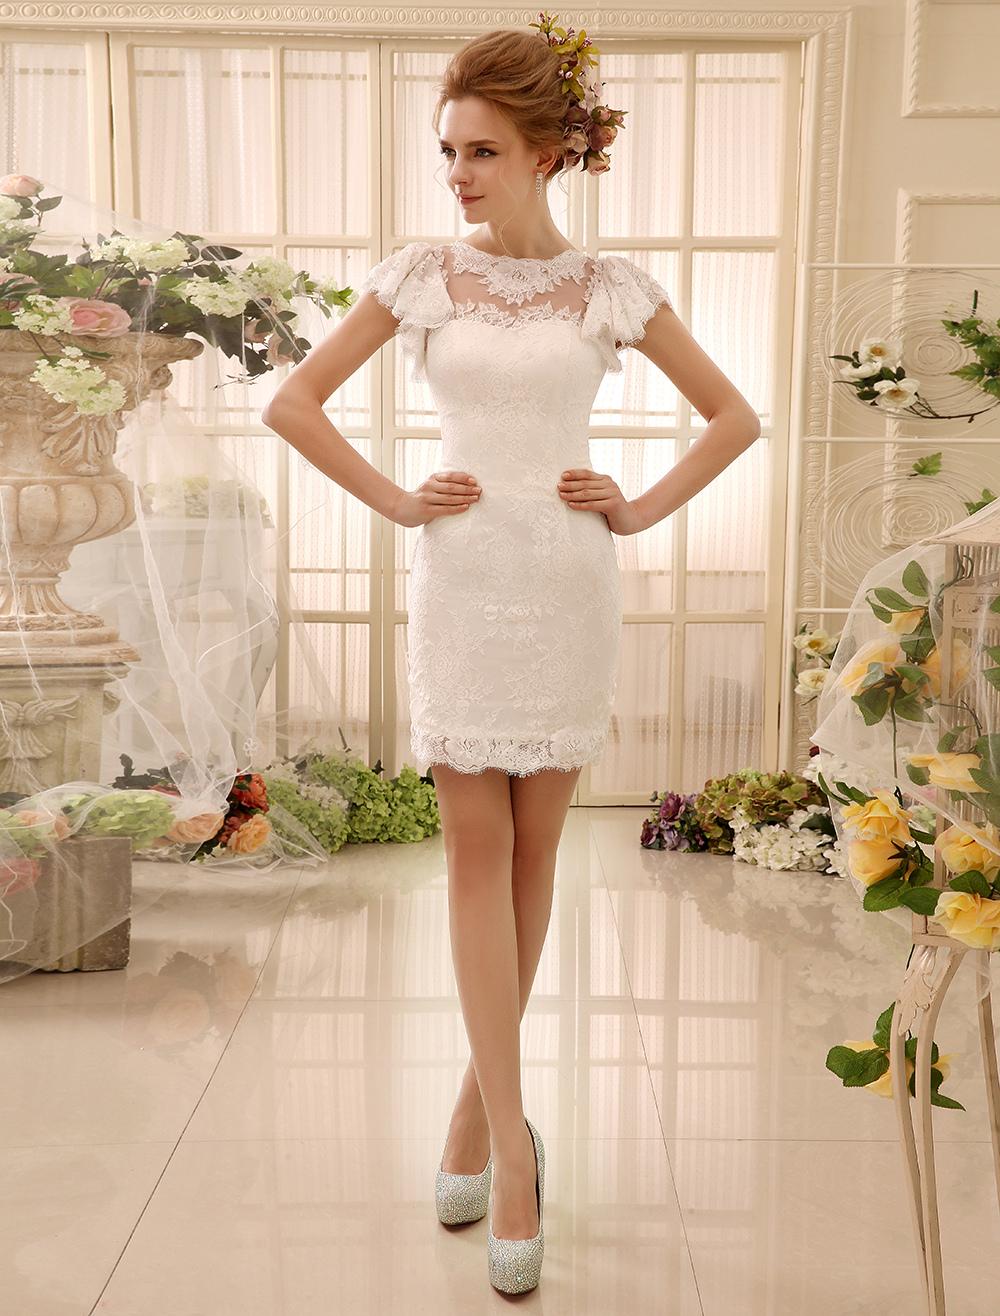 Ivory Wedding Dresses 2018 Cut Out Buttons Lace Short bridal dress Milanoo (Cheap Wedding Dress) photo